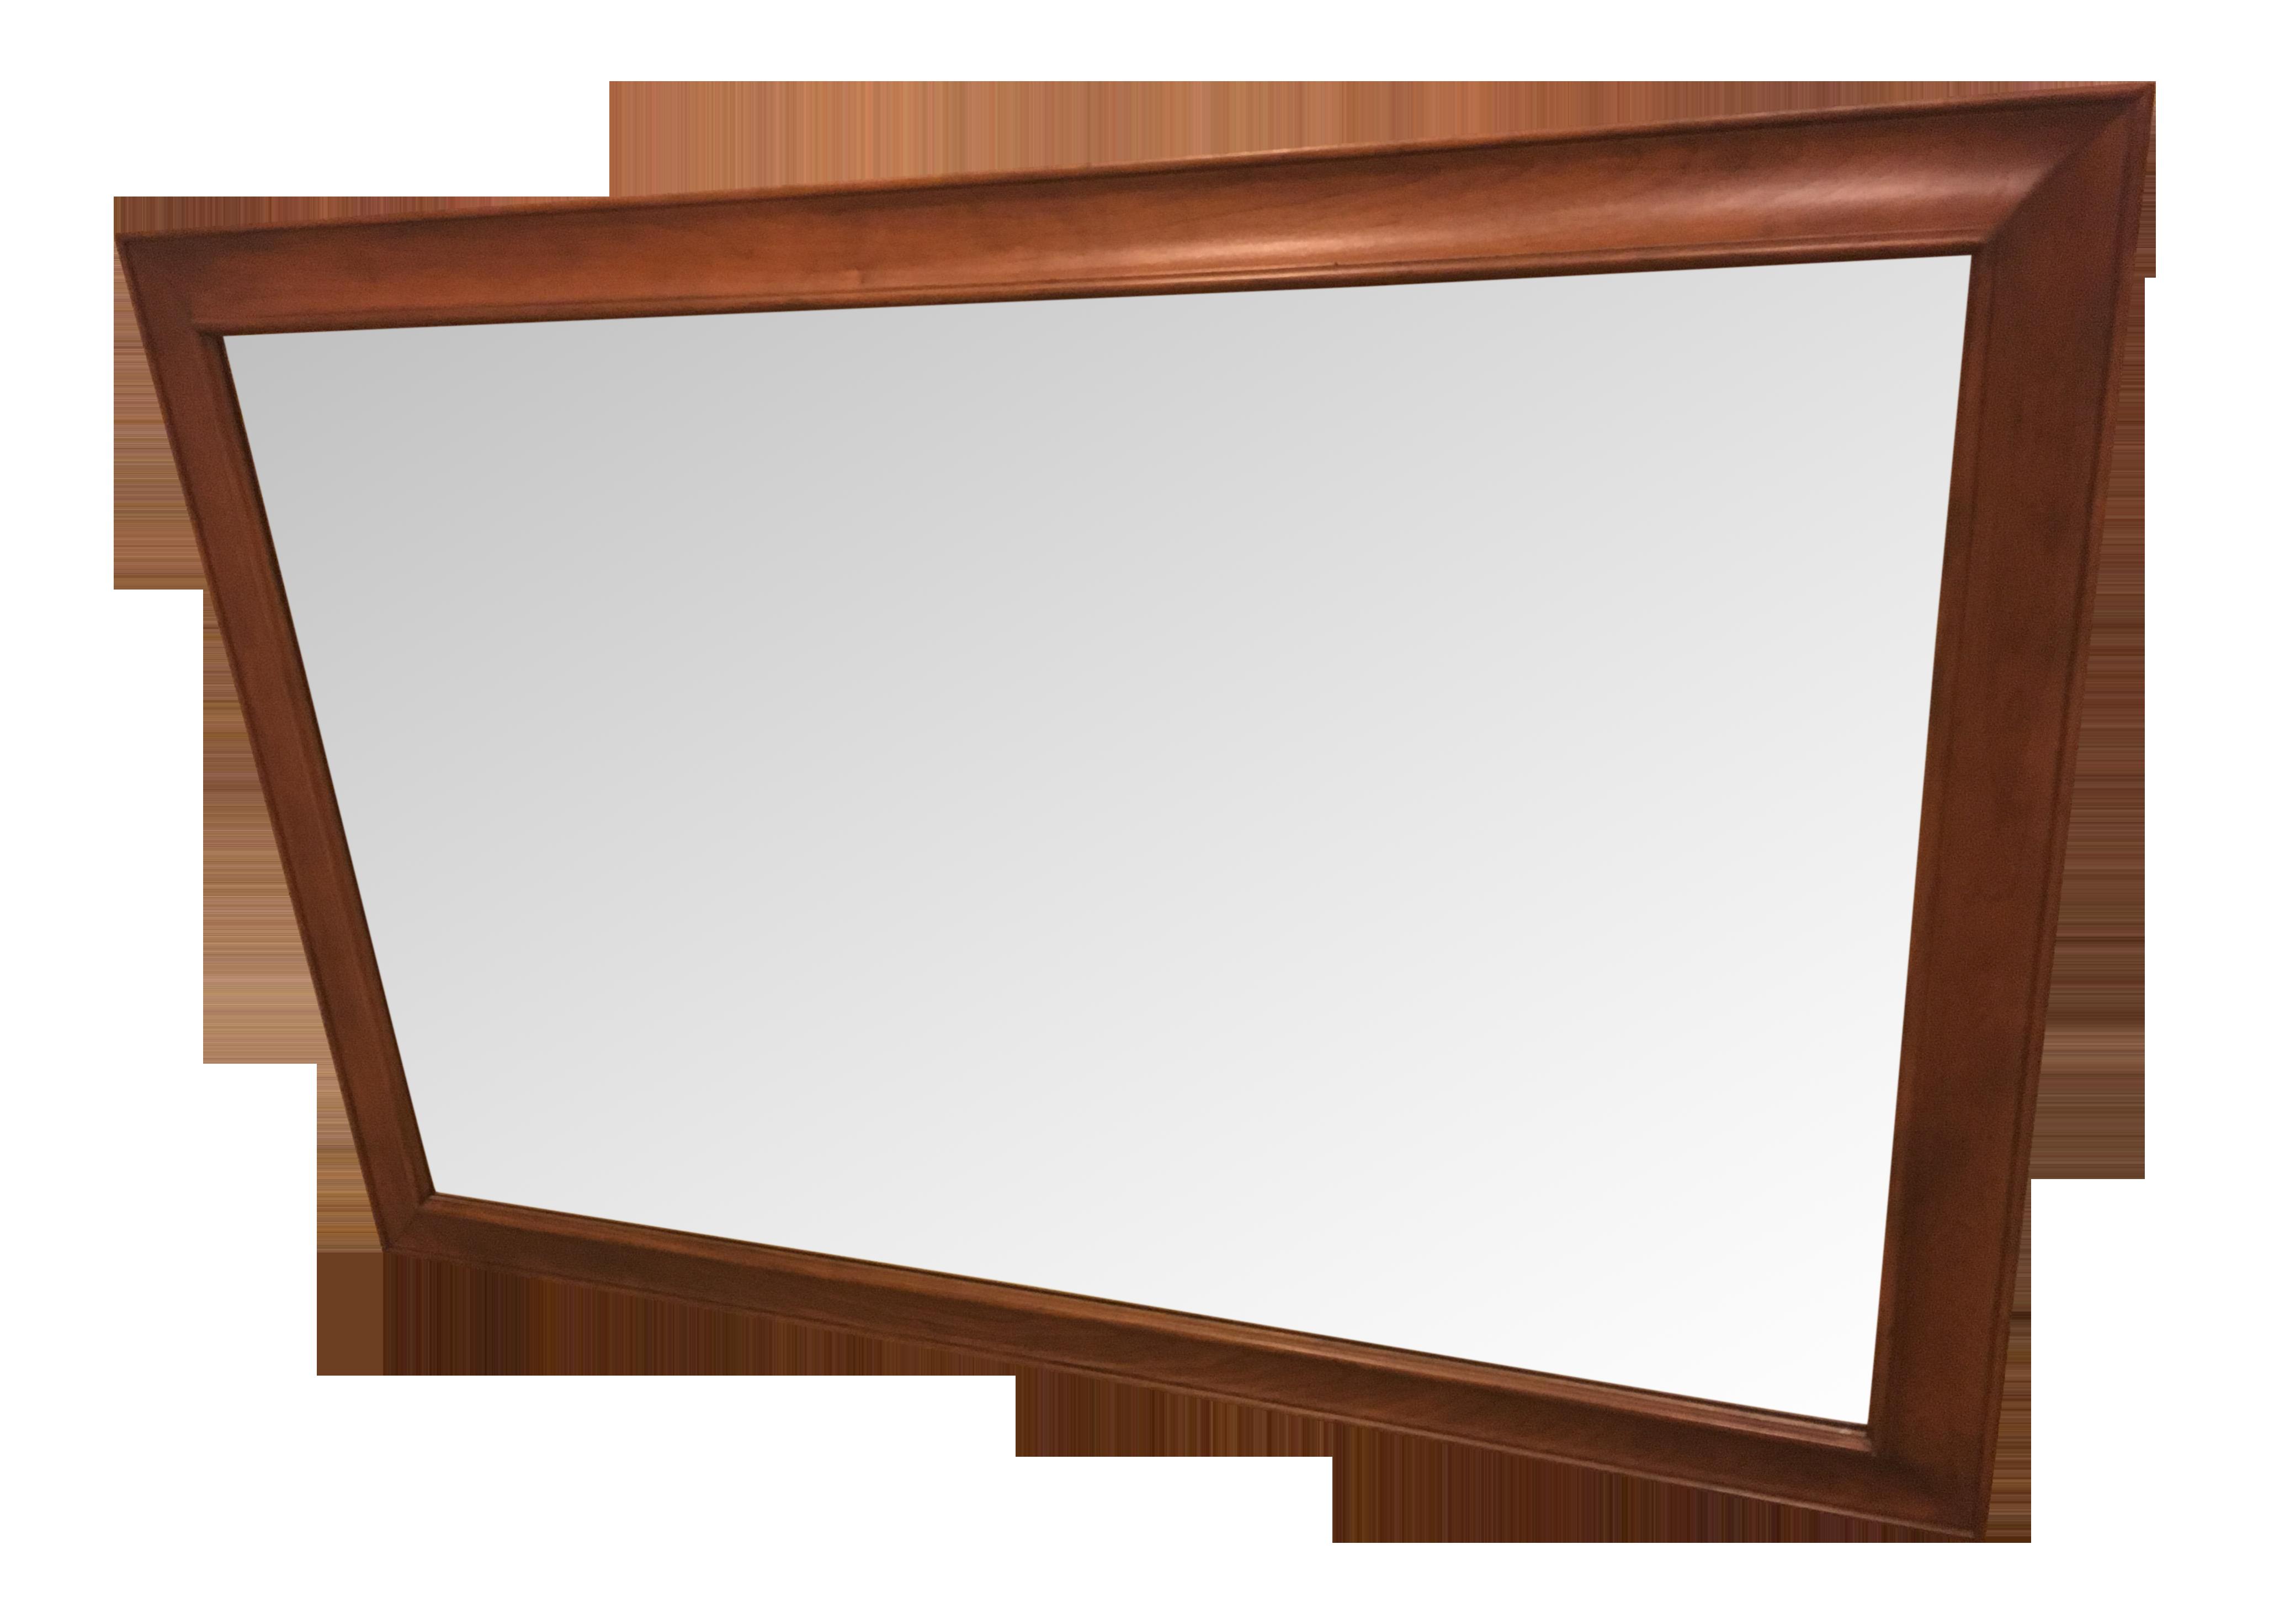 Cherry framed mirror